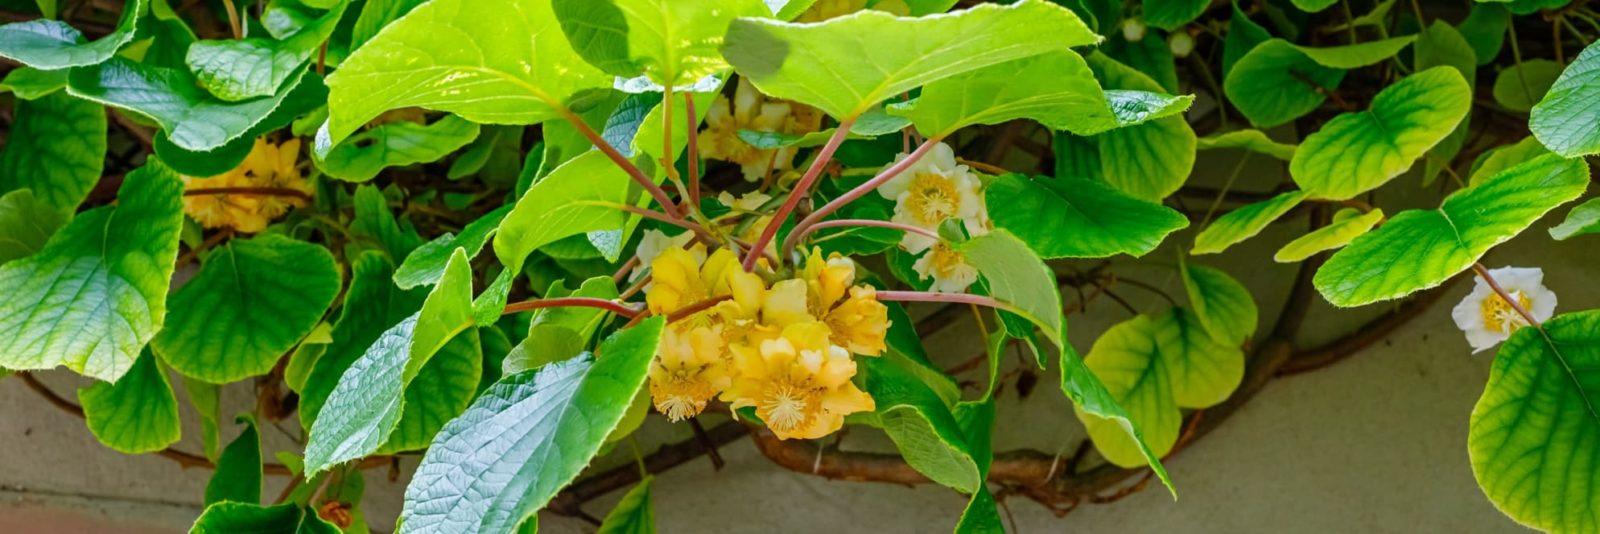 flowers of the kiwi plant